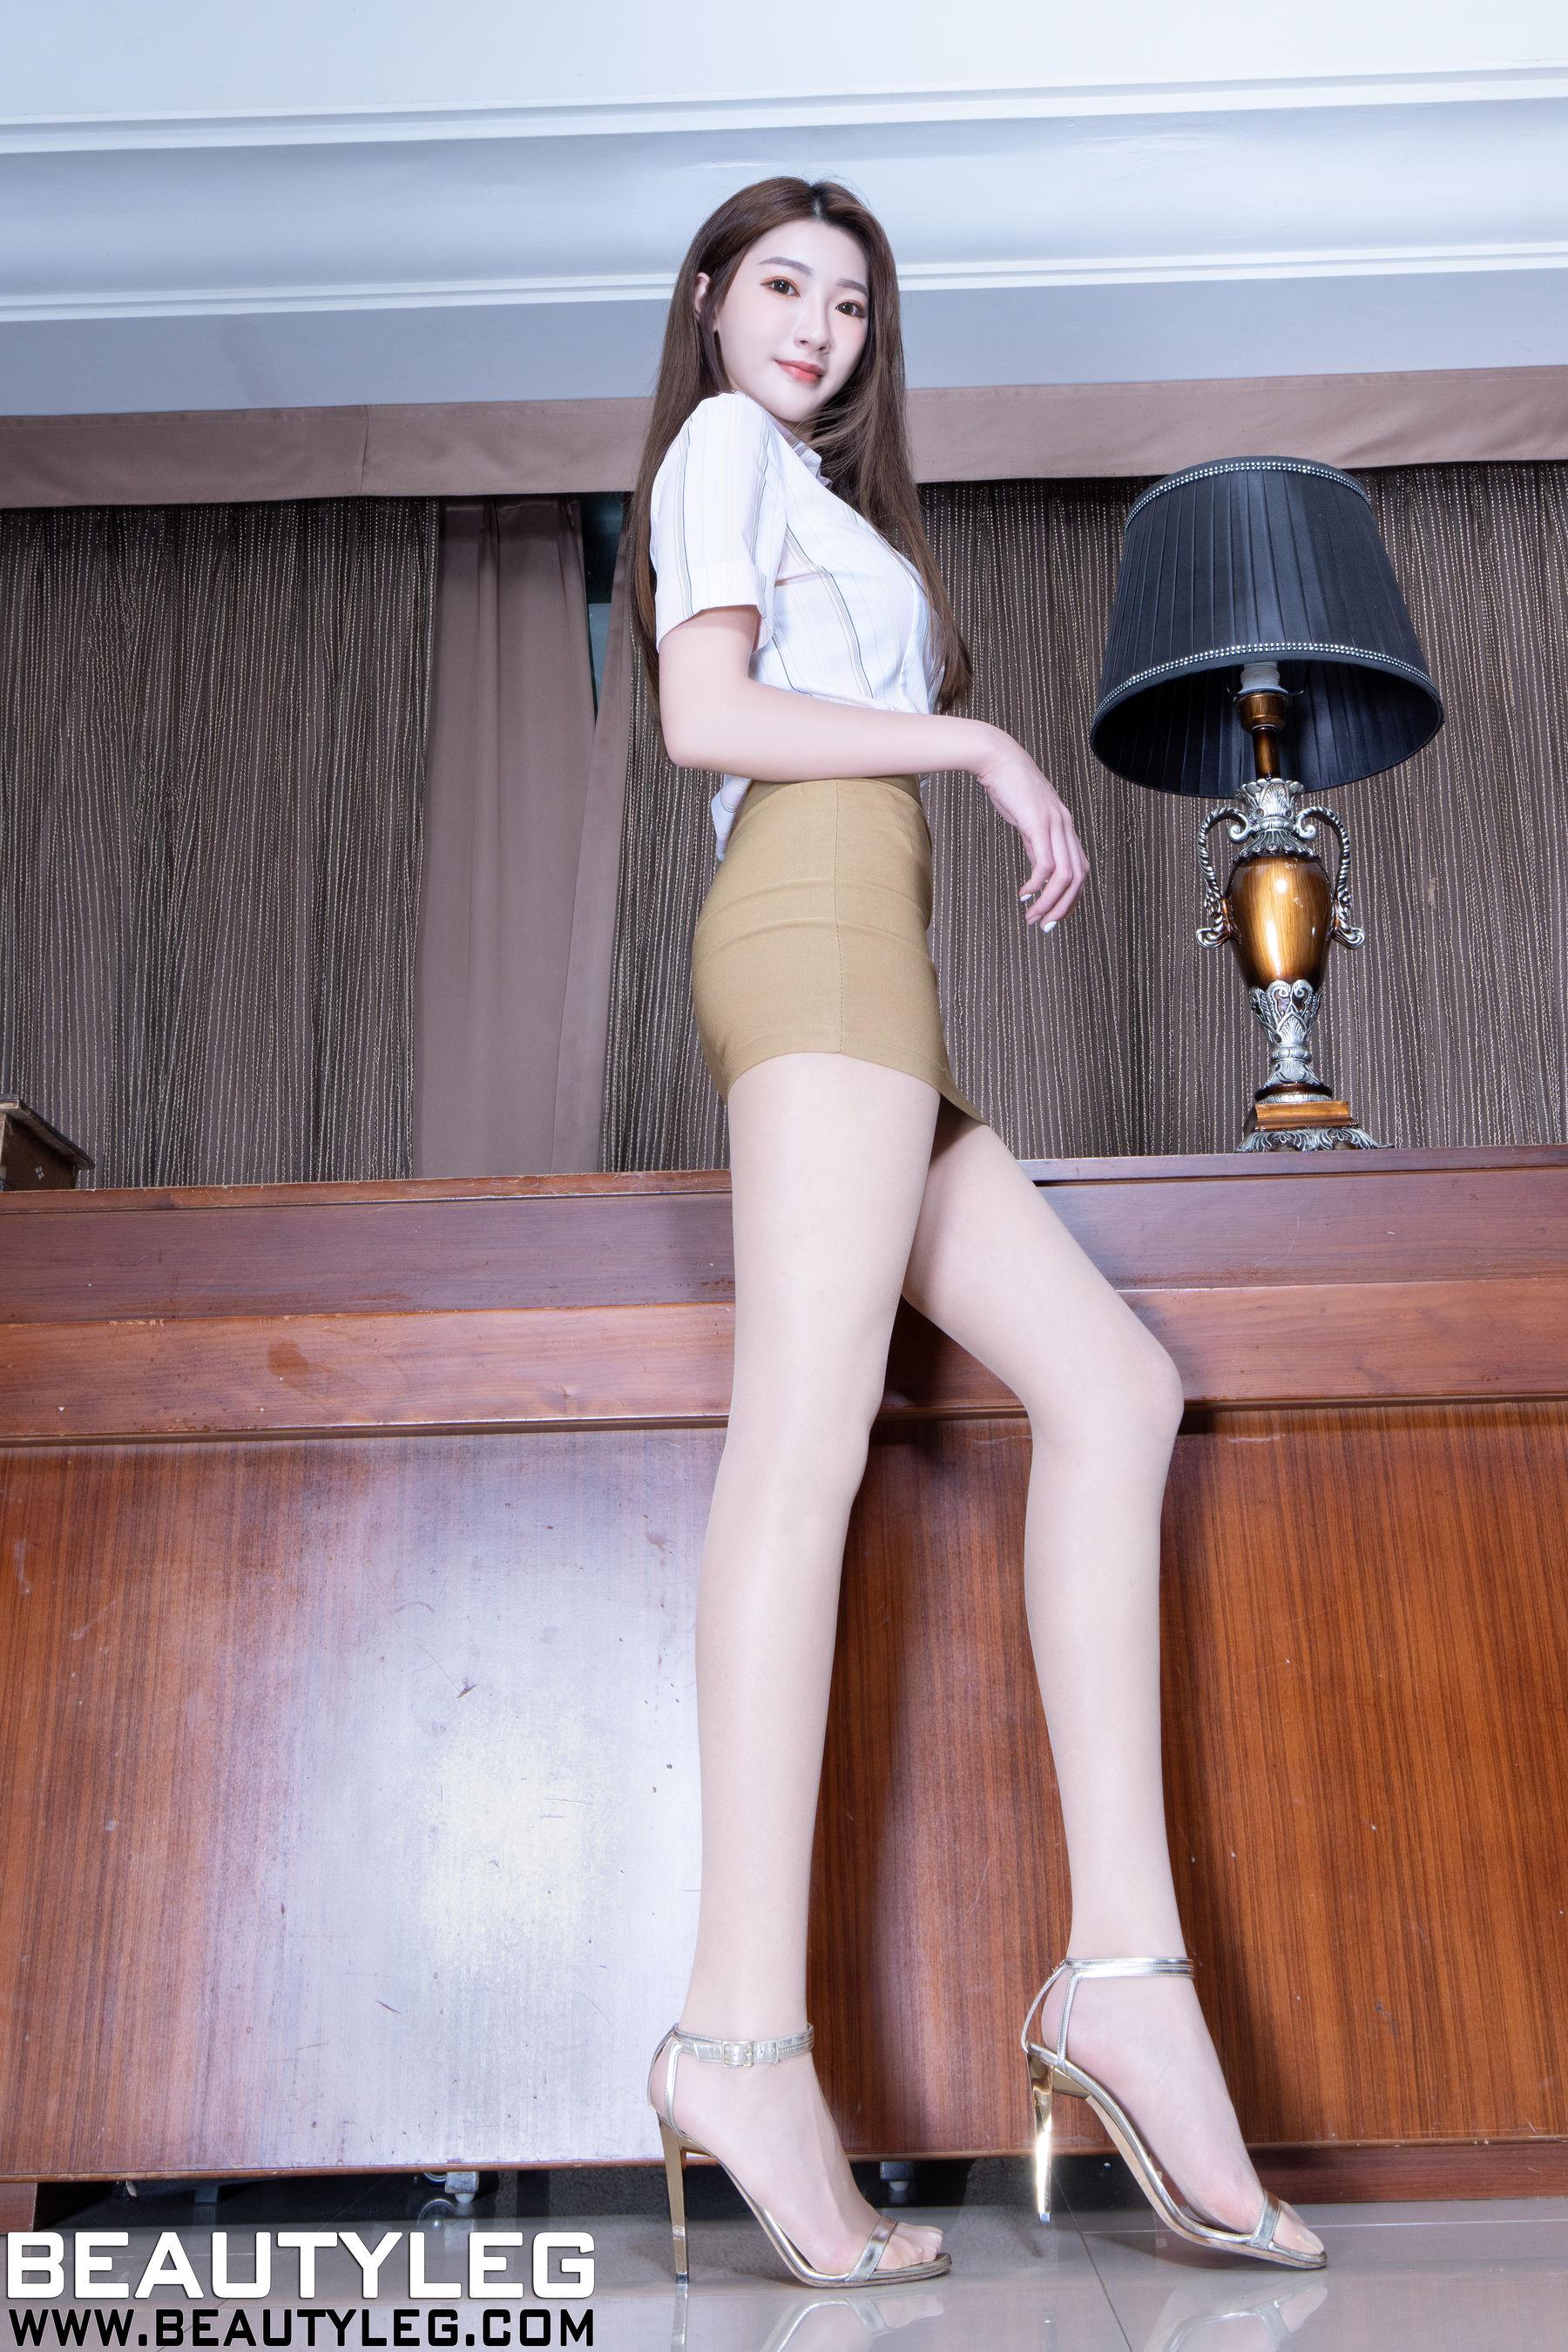 VOL.889 [Beautyleg]丝袜制服:腿模Momo(Beautyleg Momo)超高清个人性感漂亮大图(58P)